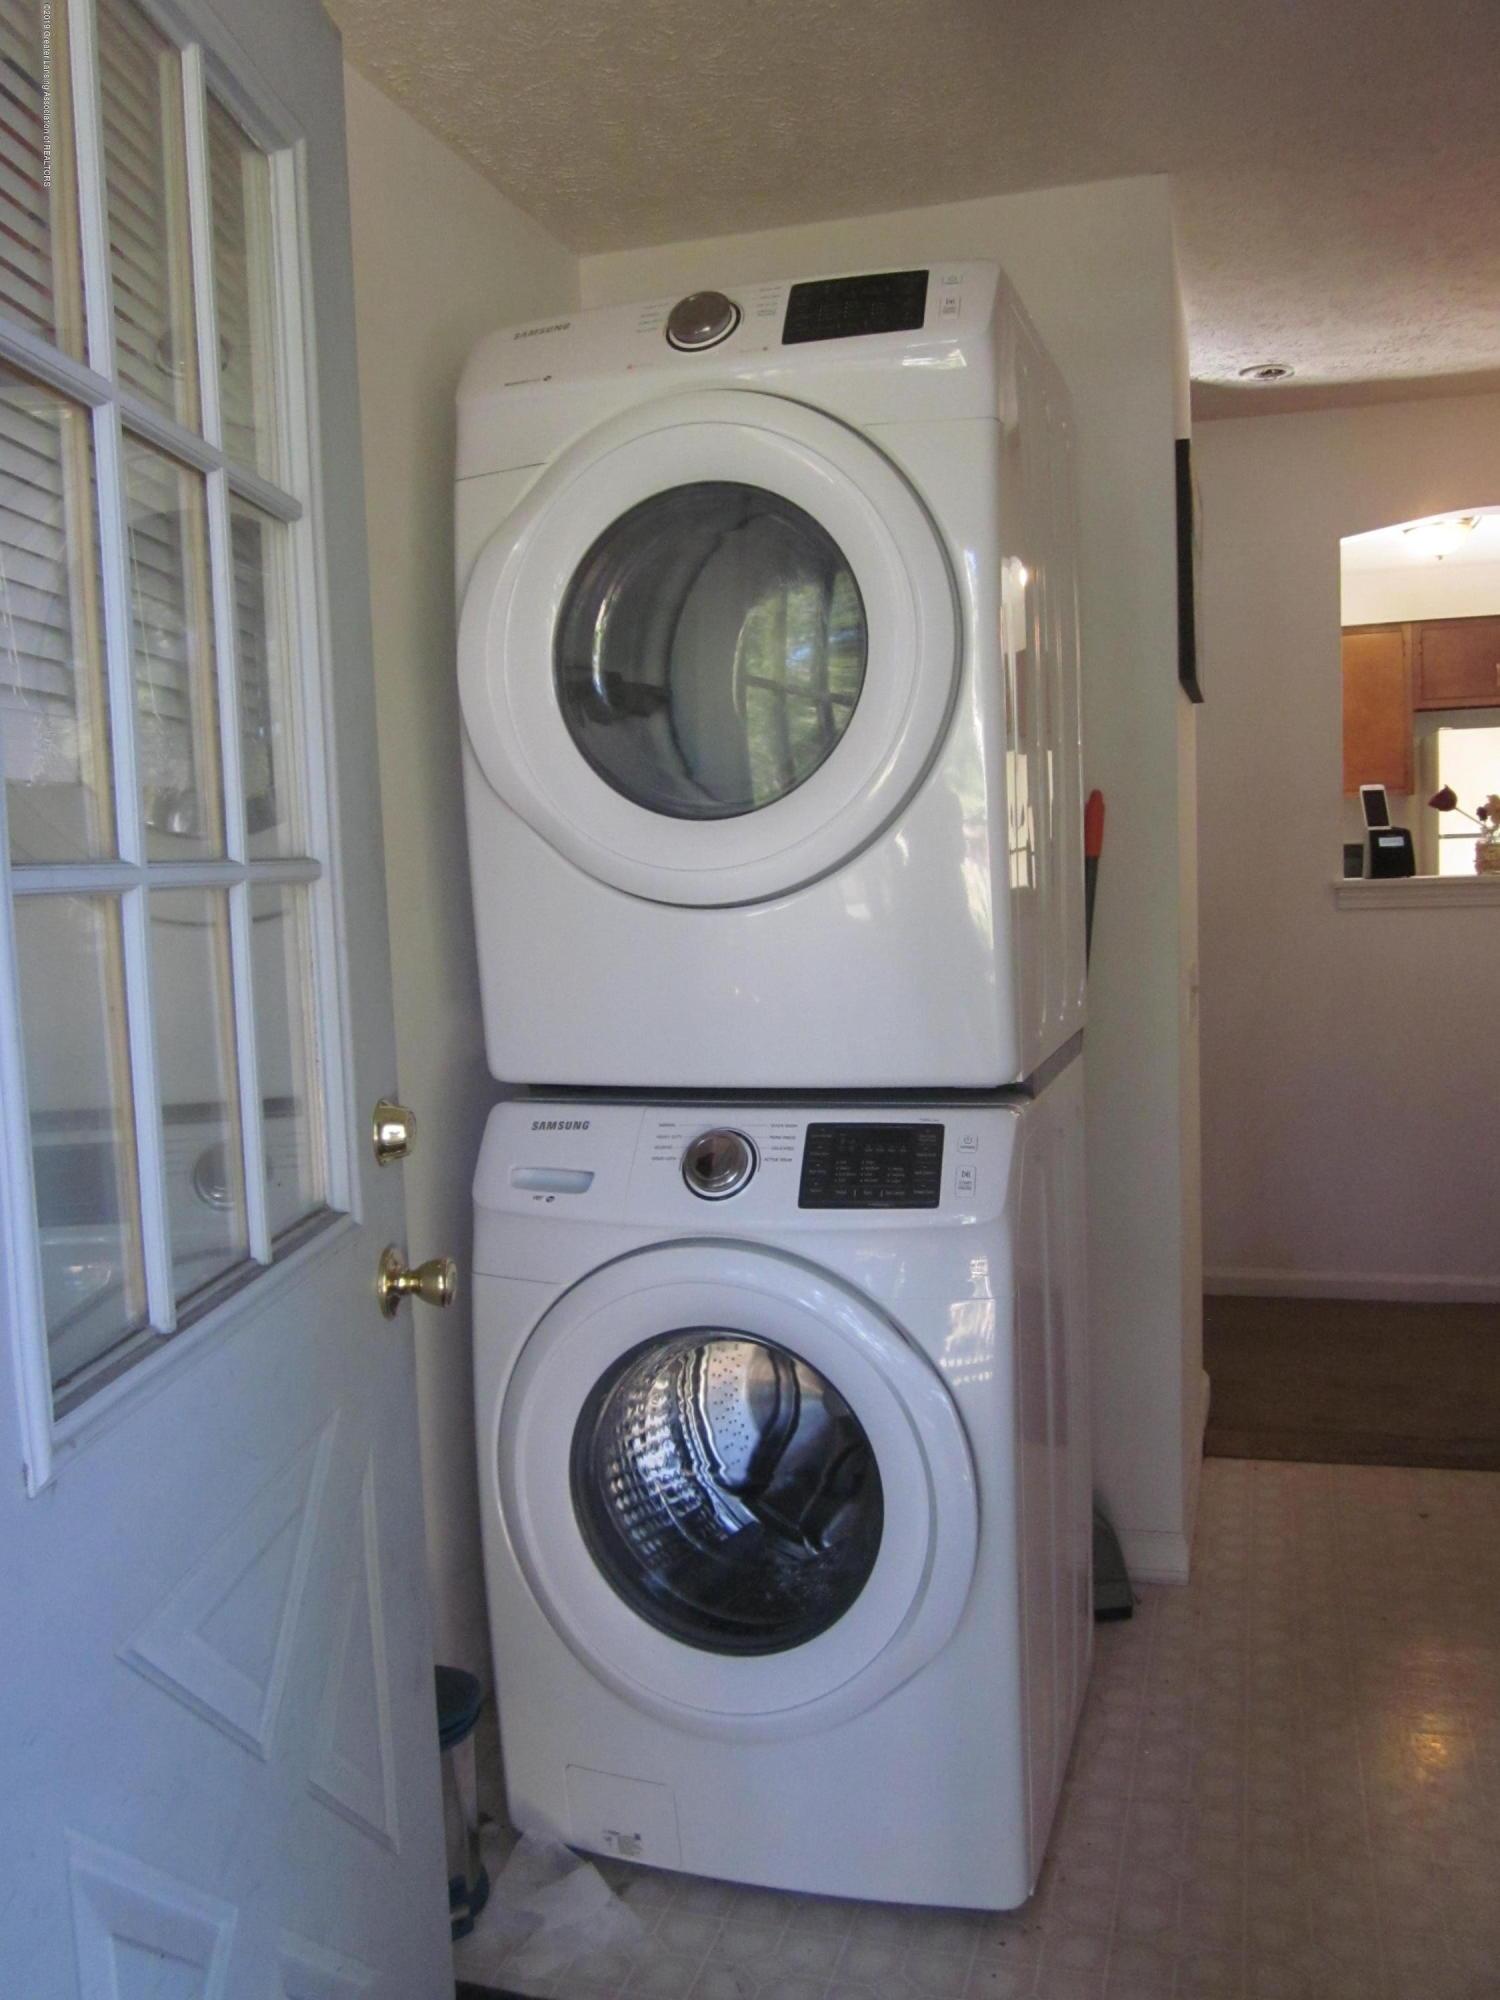 535 S Magnolia Ave - Laundry - 12